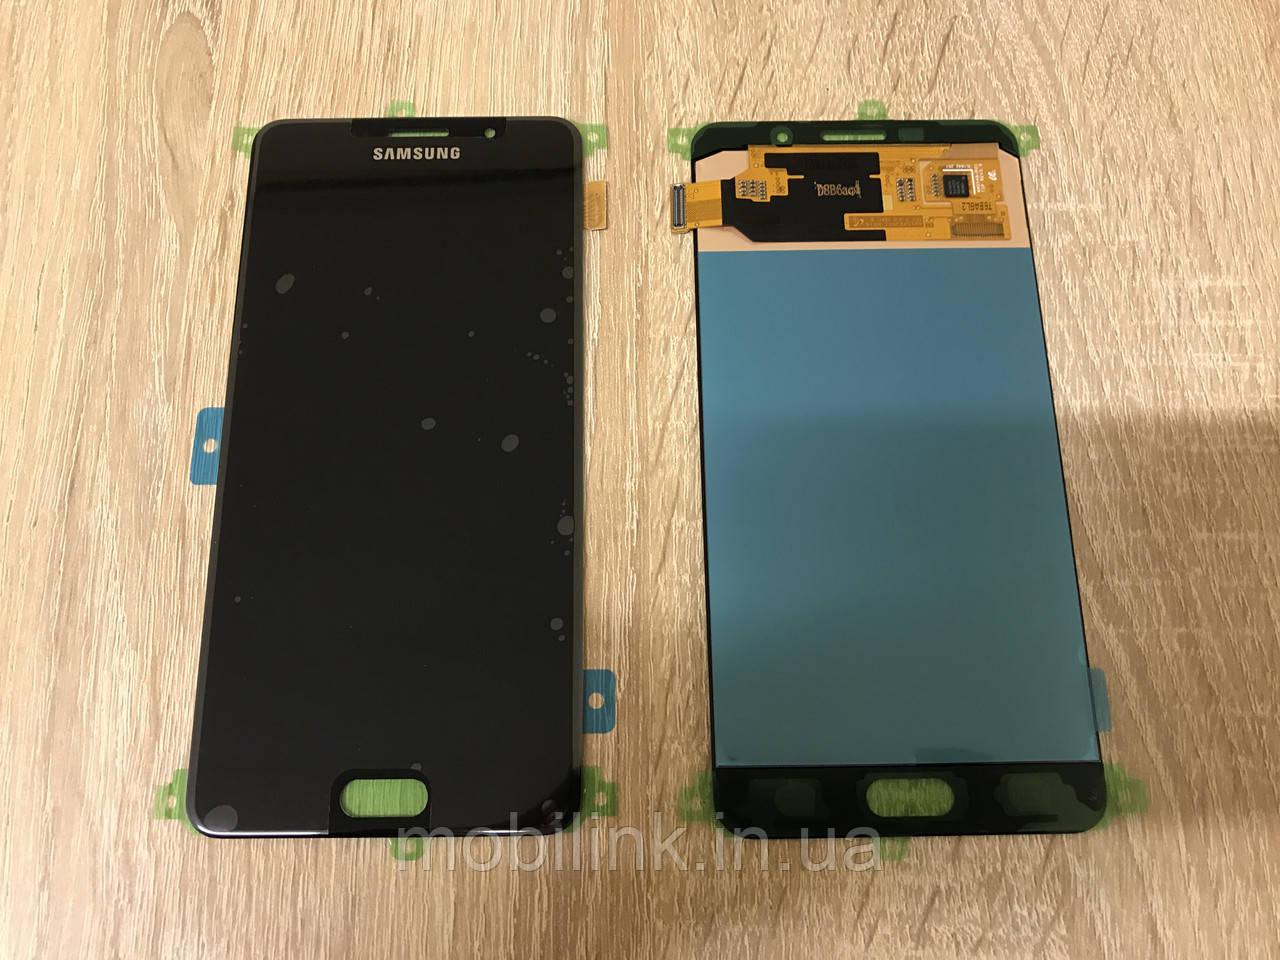 Дисплей на Samsung A710 Galaxy A7(2016) Чёрный(Black),GH97-18229B, Super AMOLED!